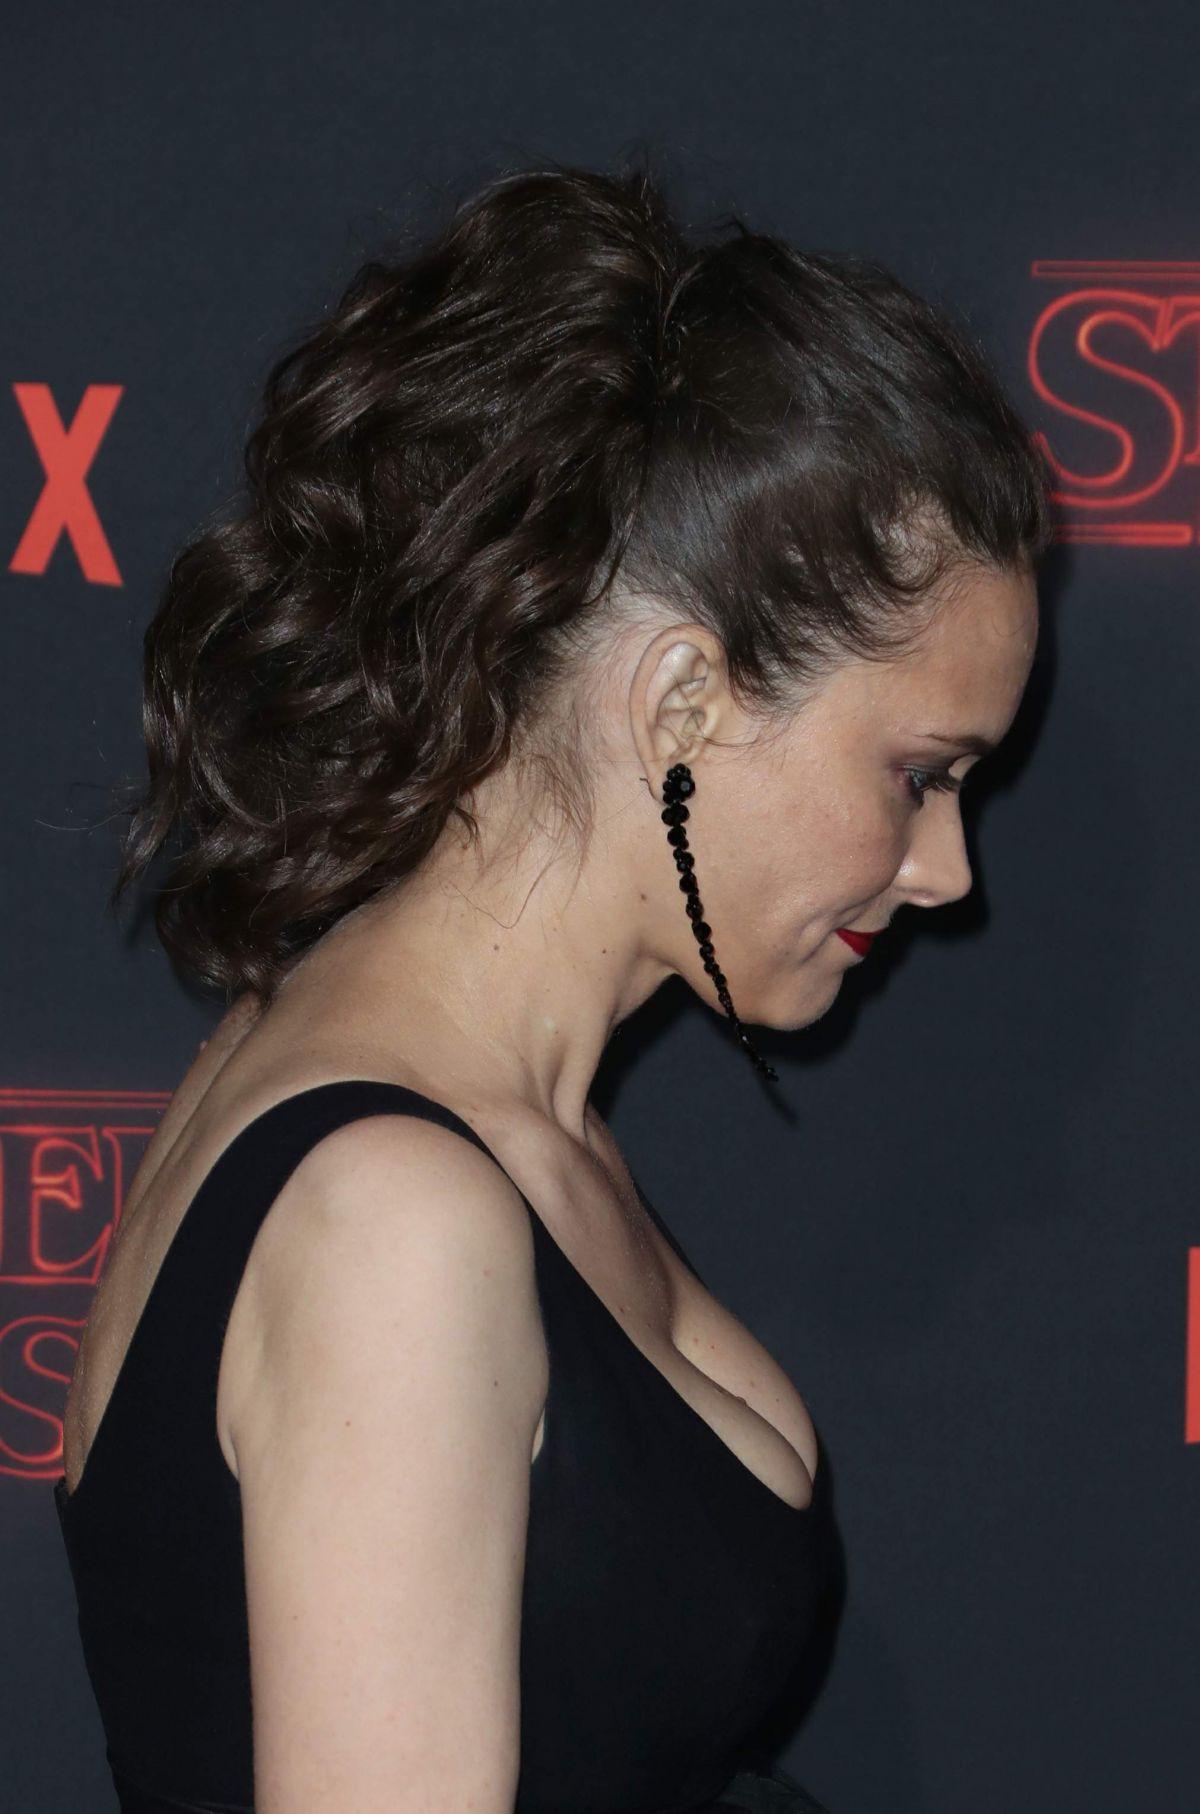 WINONA RYDER at Stranger Things Season 2 Premiere in Los ...